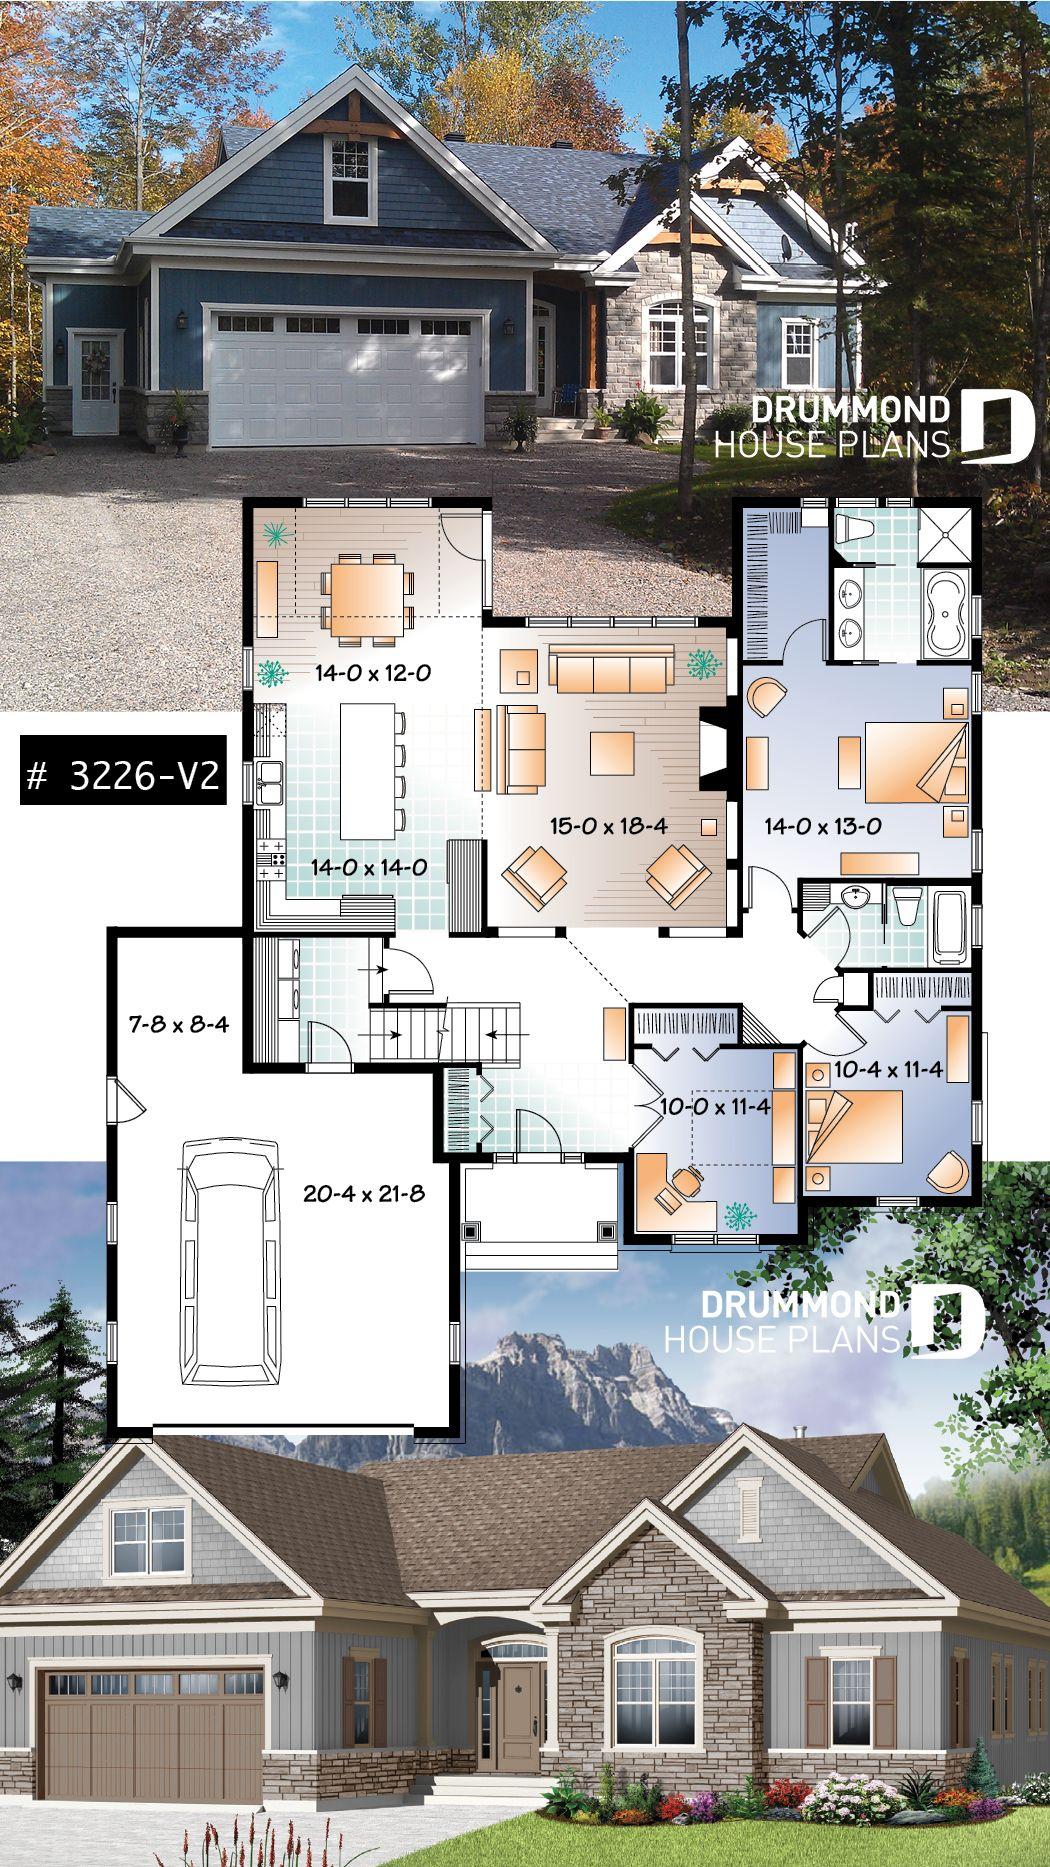 U Shape Ranch House Plan 2 Car Garage Master Suite Large